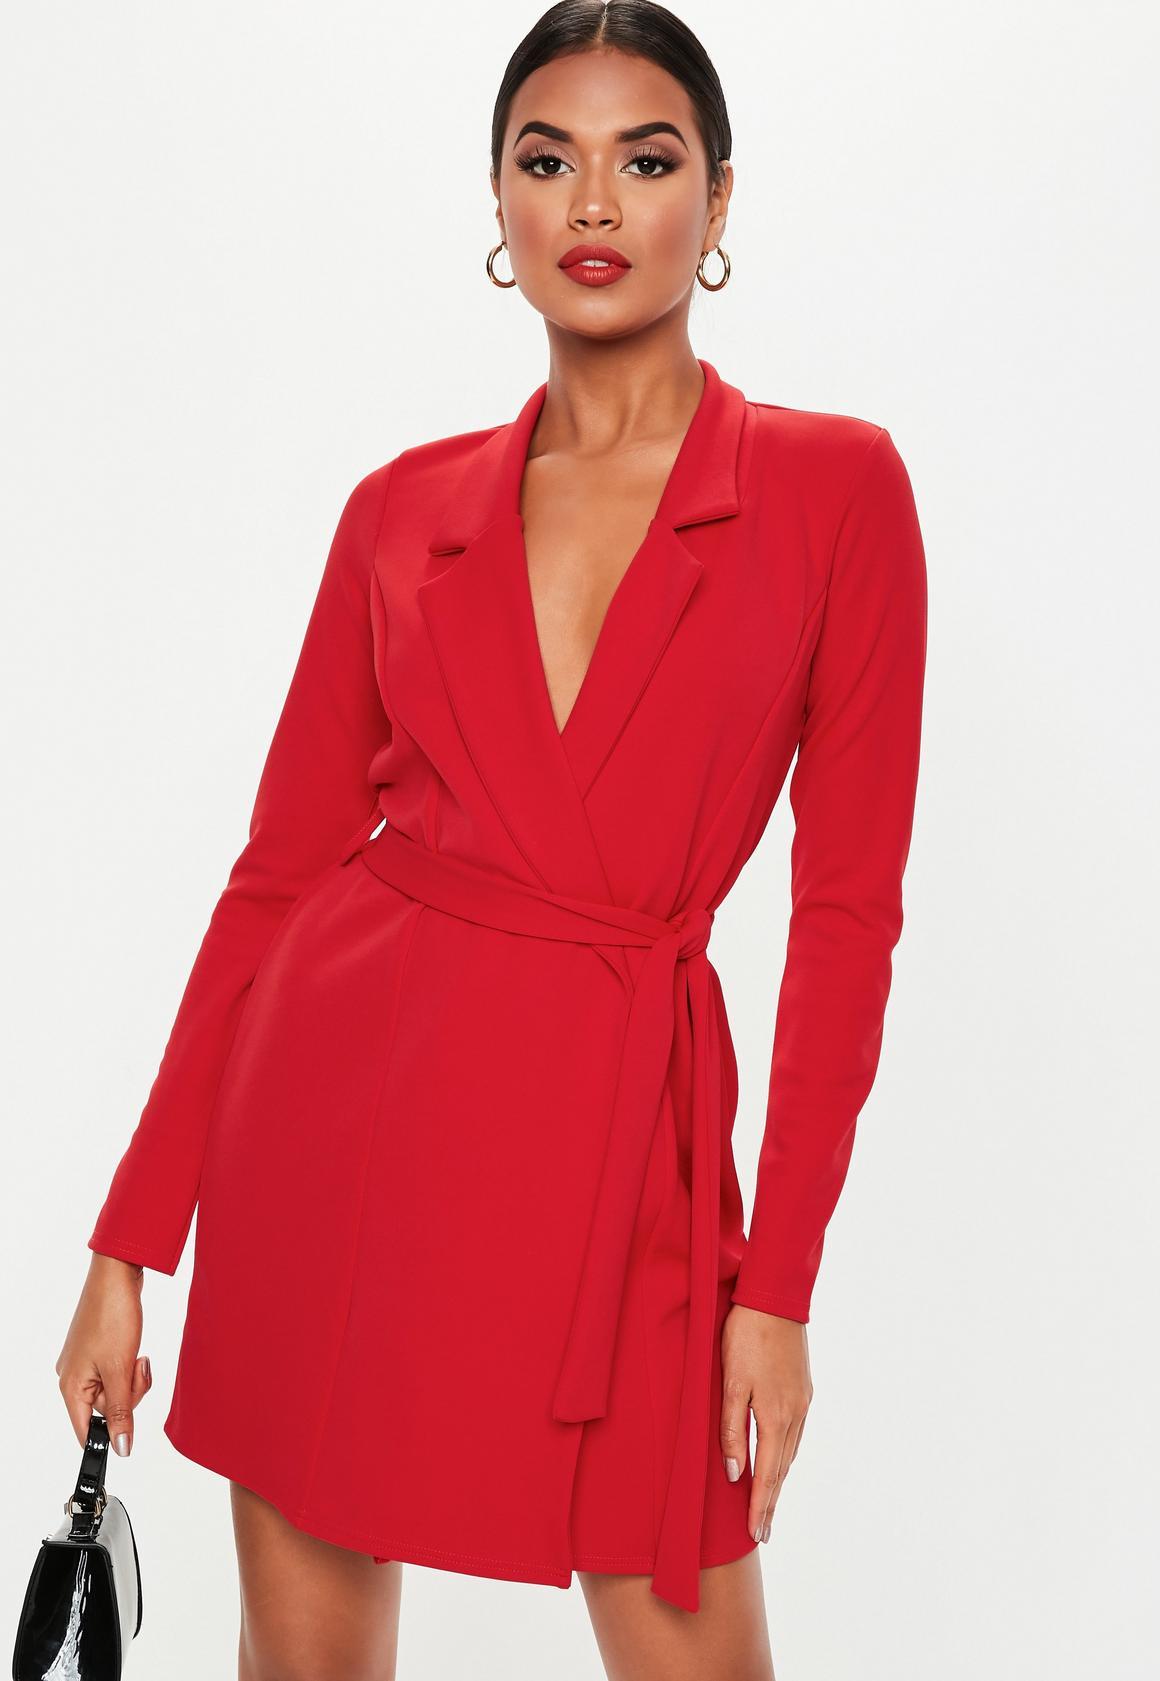 Red Long Sleeve Blazer Dress @MISSGUIDED